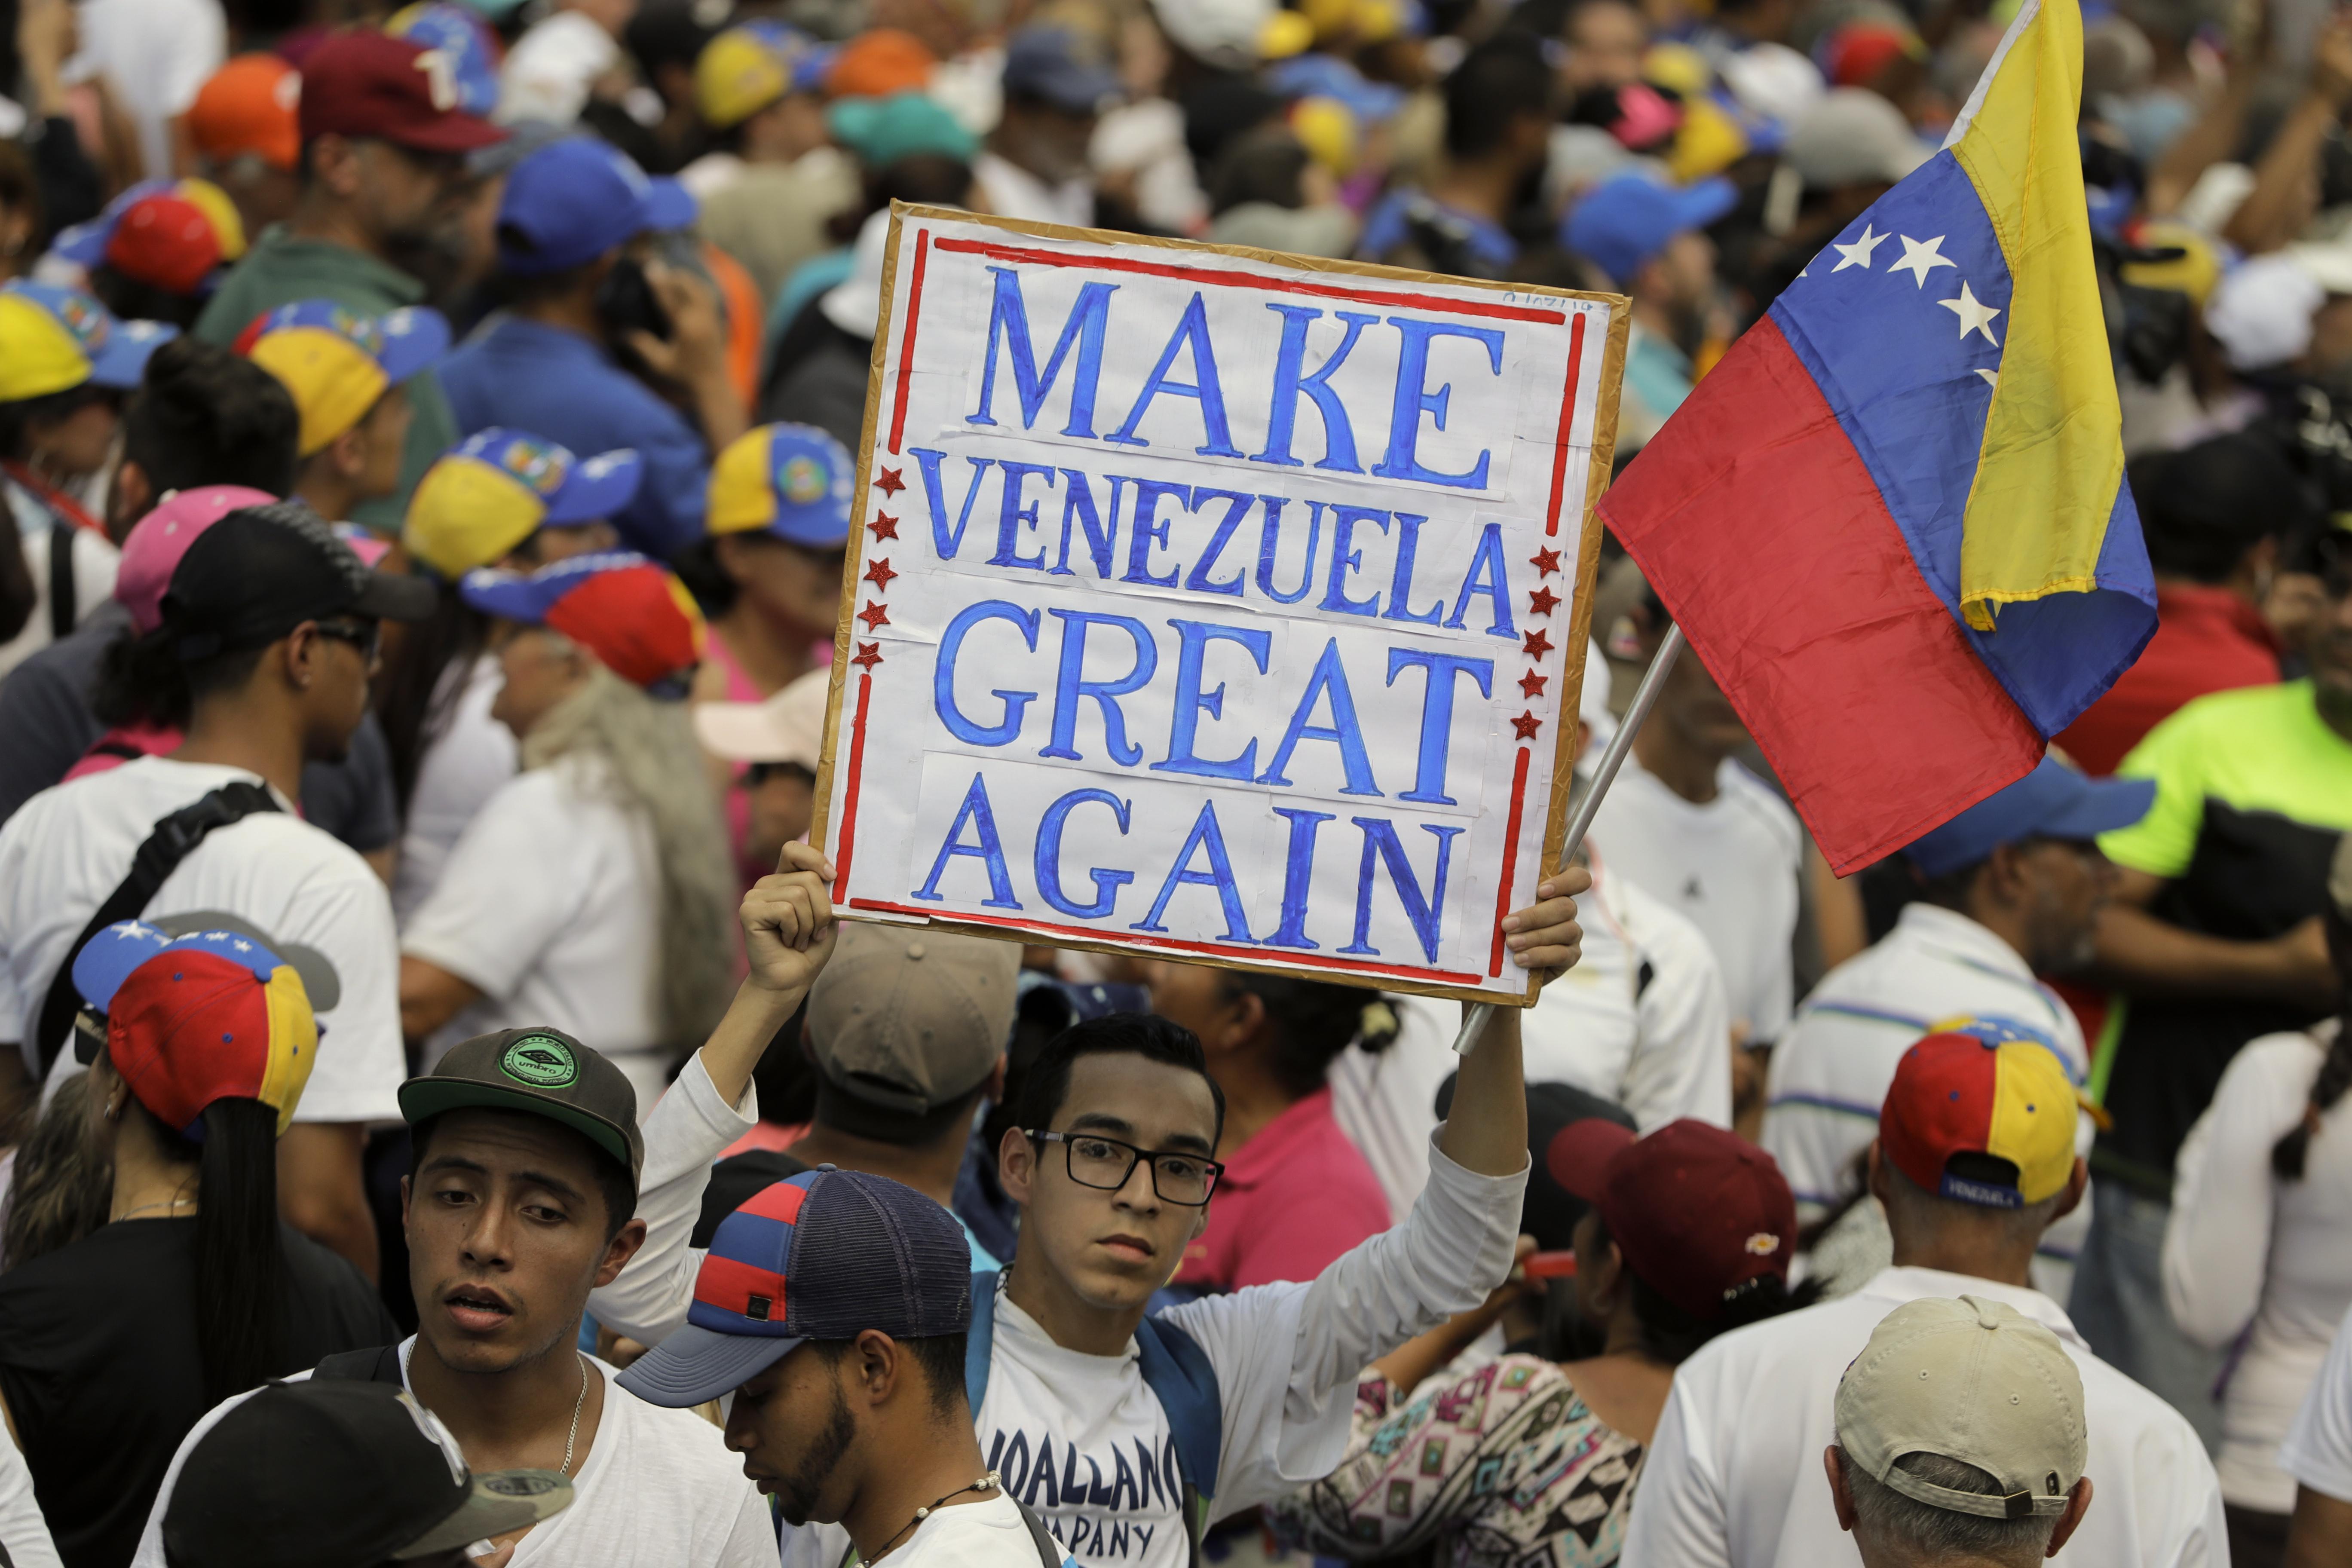 VP Pence: UN must disinvite Maduro, deem Juan Guaido as Venezuelan leader